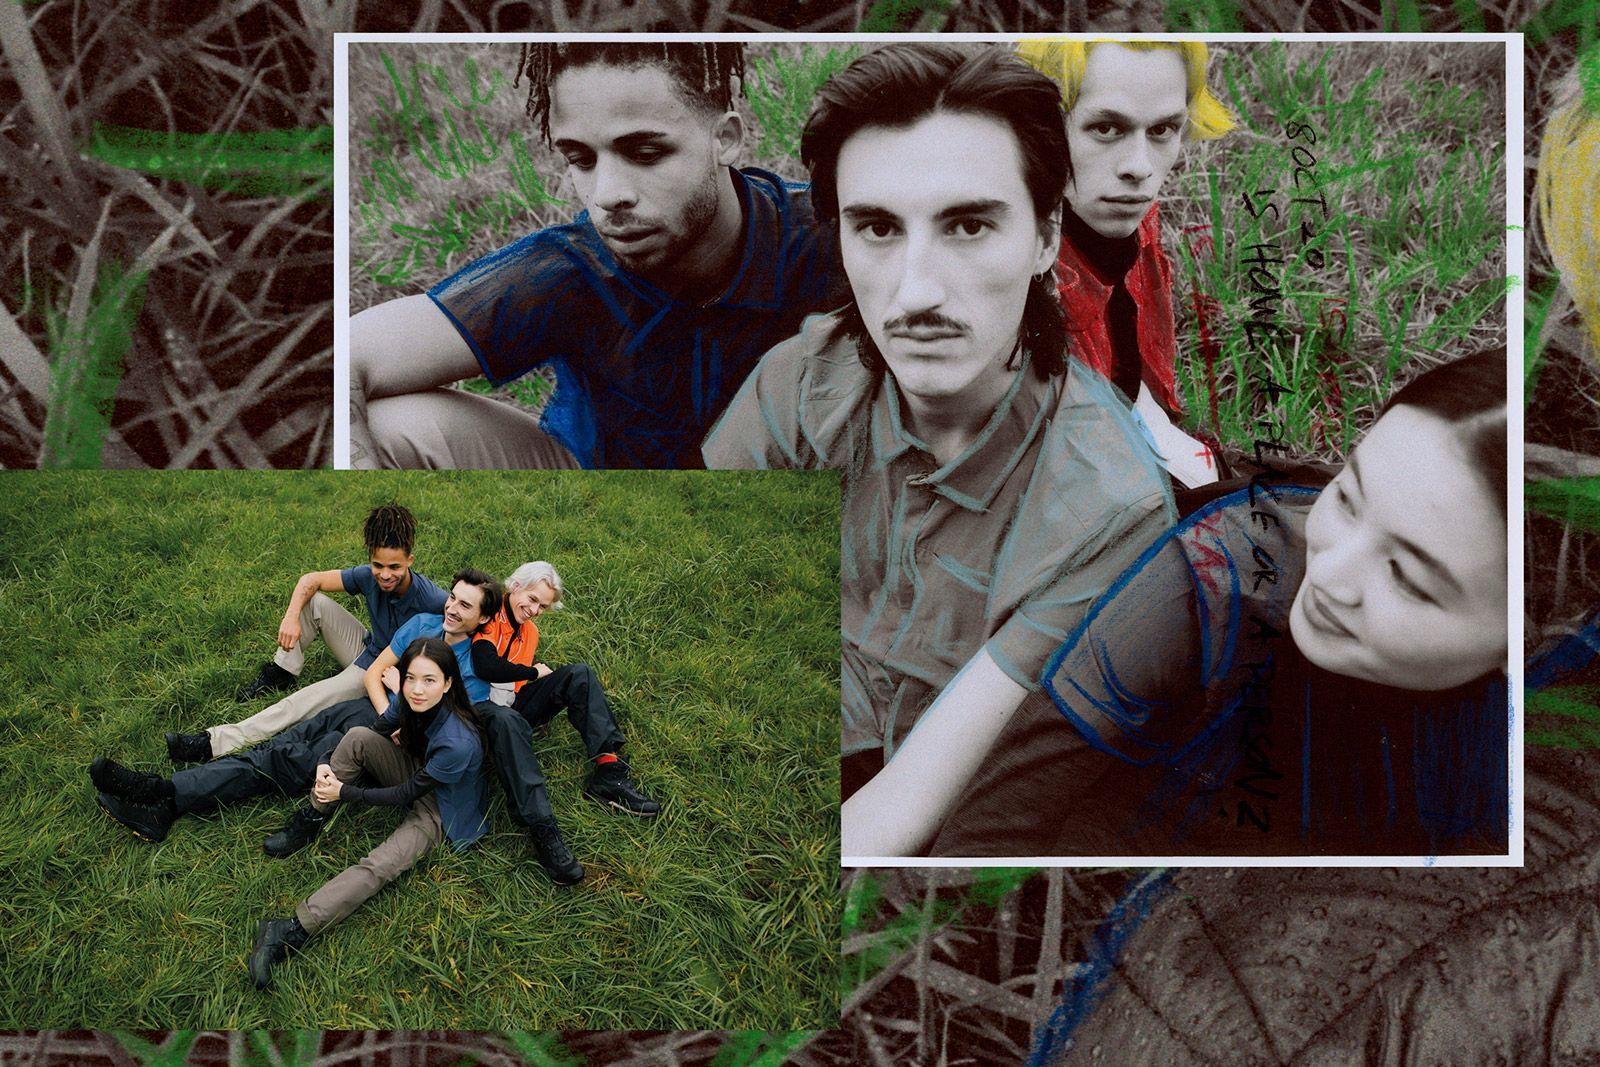 JFxHighsnobiety_LauraKaczmarek-collage-001